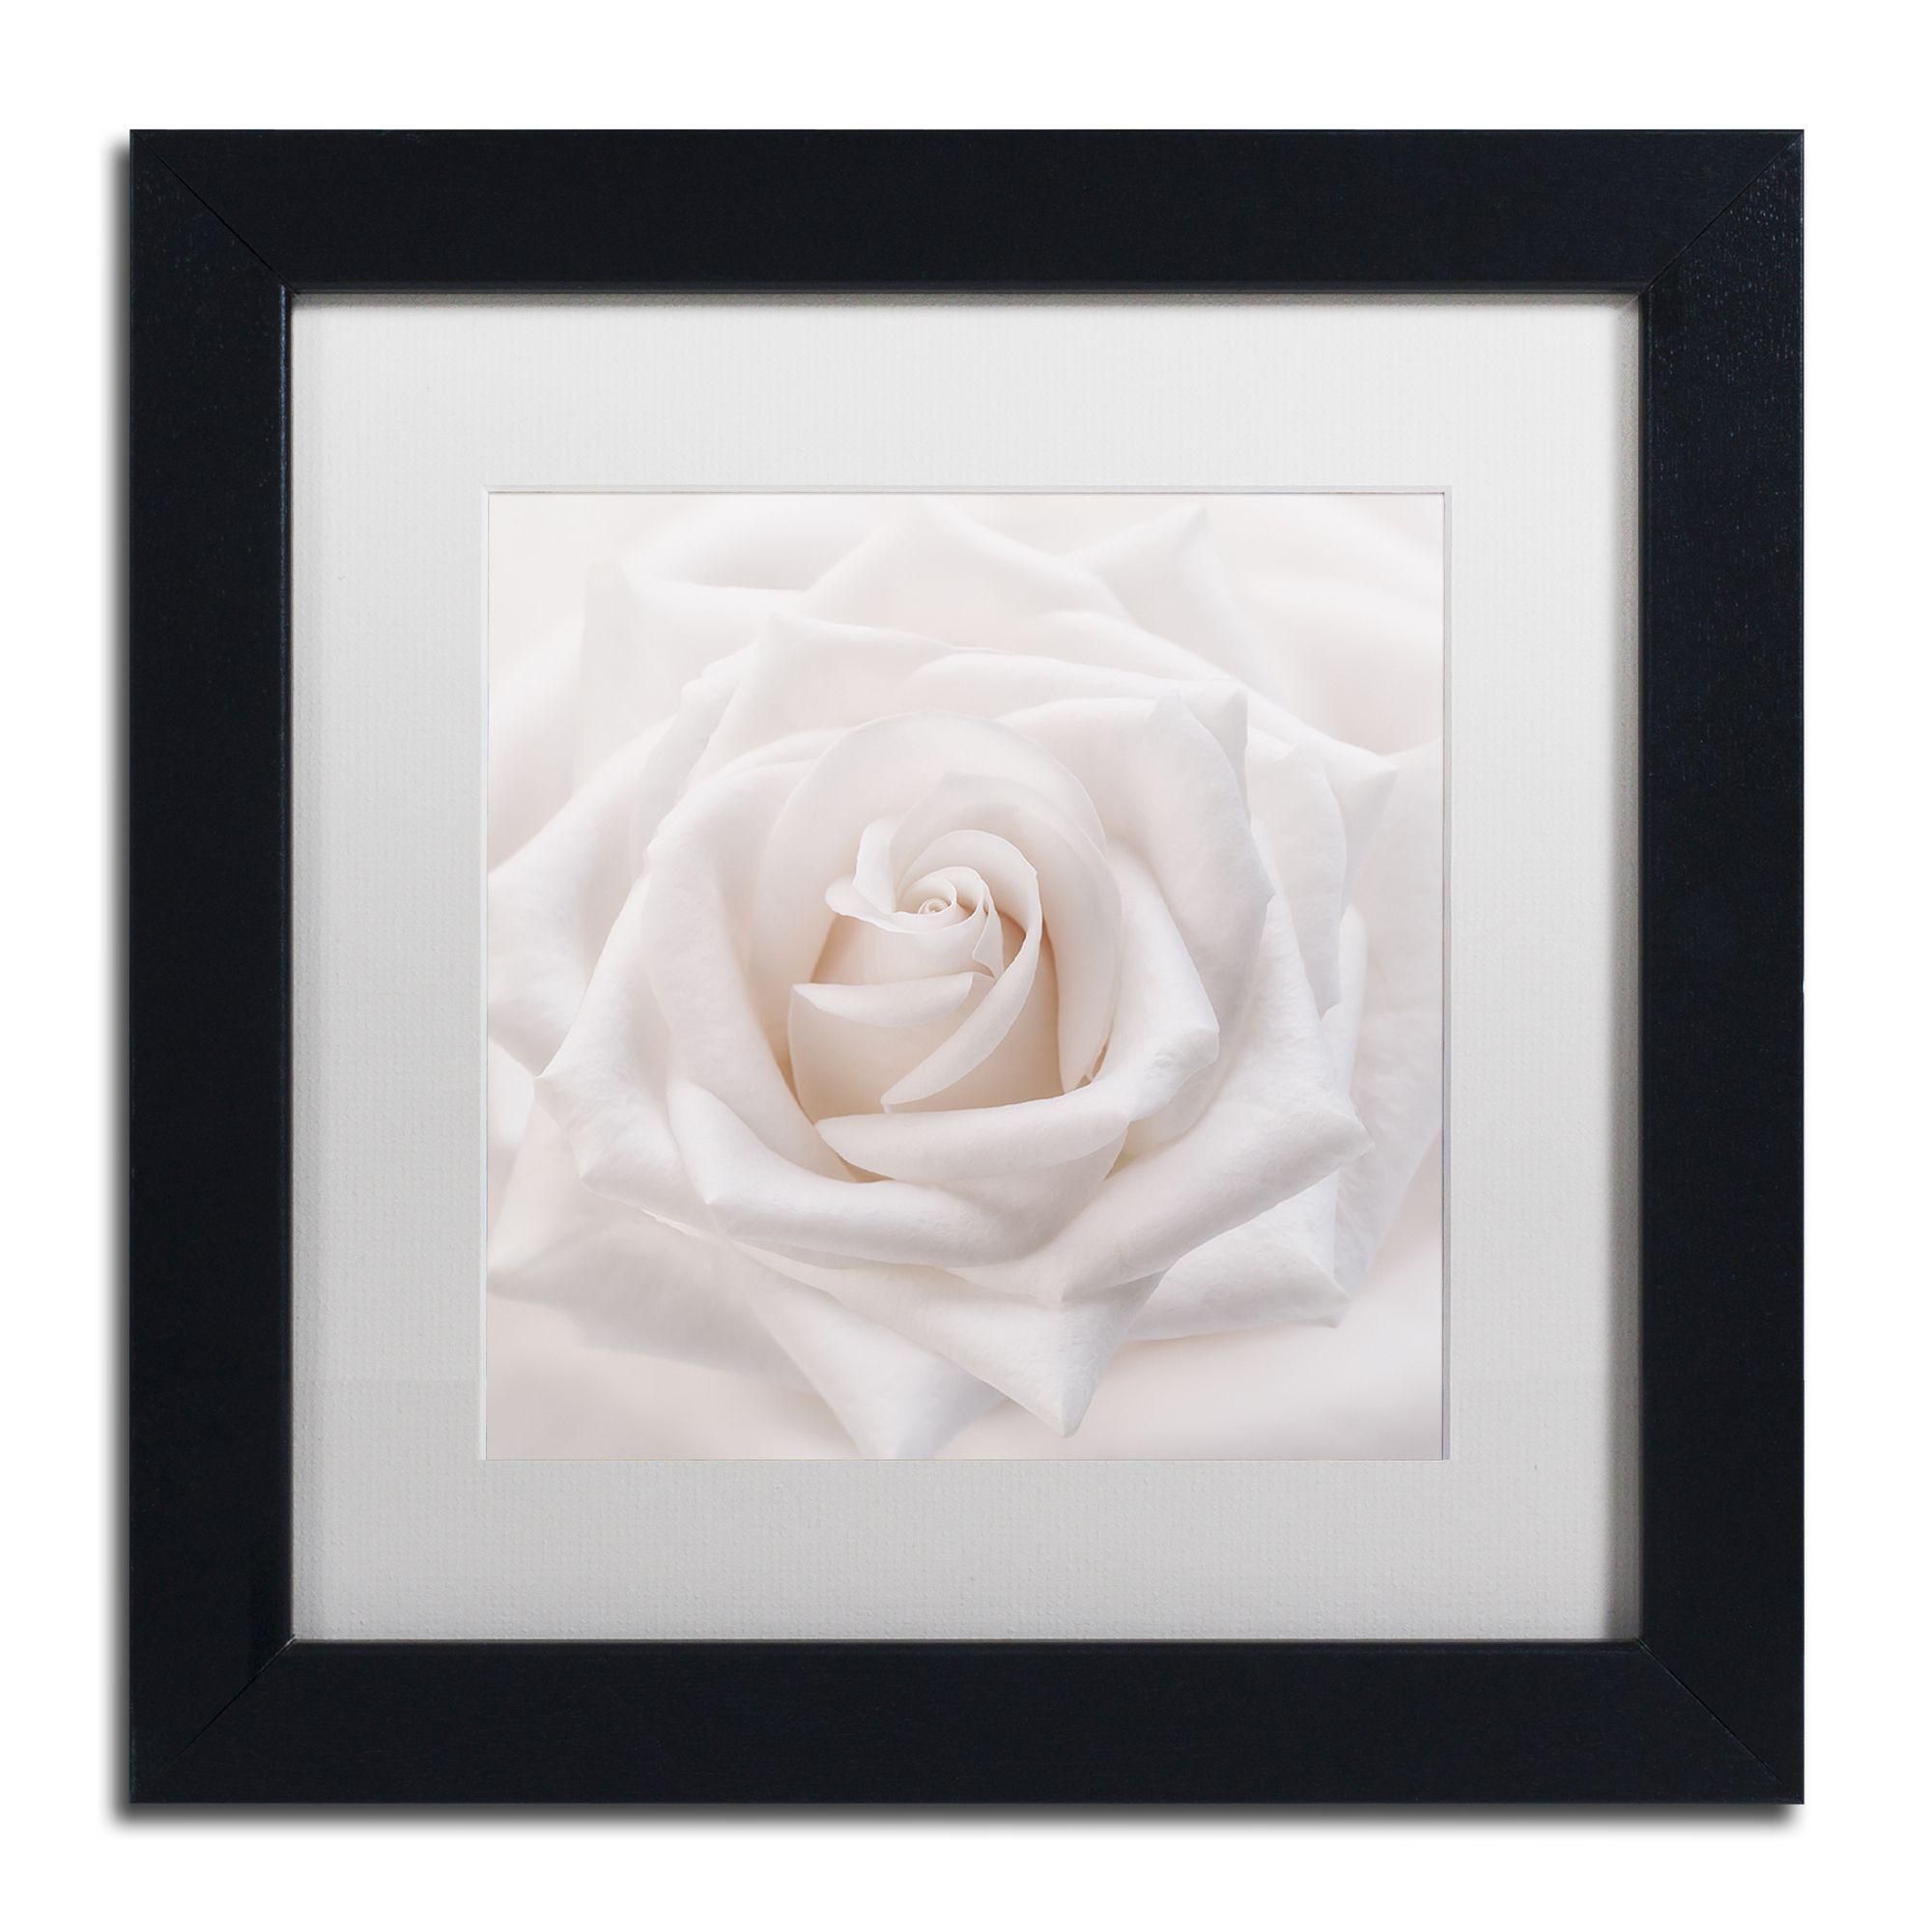 Cora Niele 'Soft White Rose' Matted Framed Art